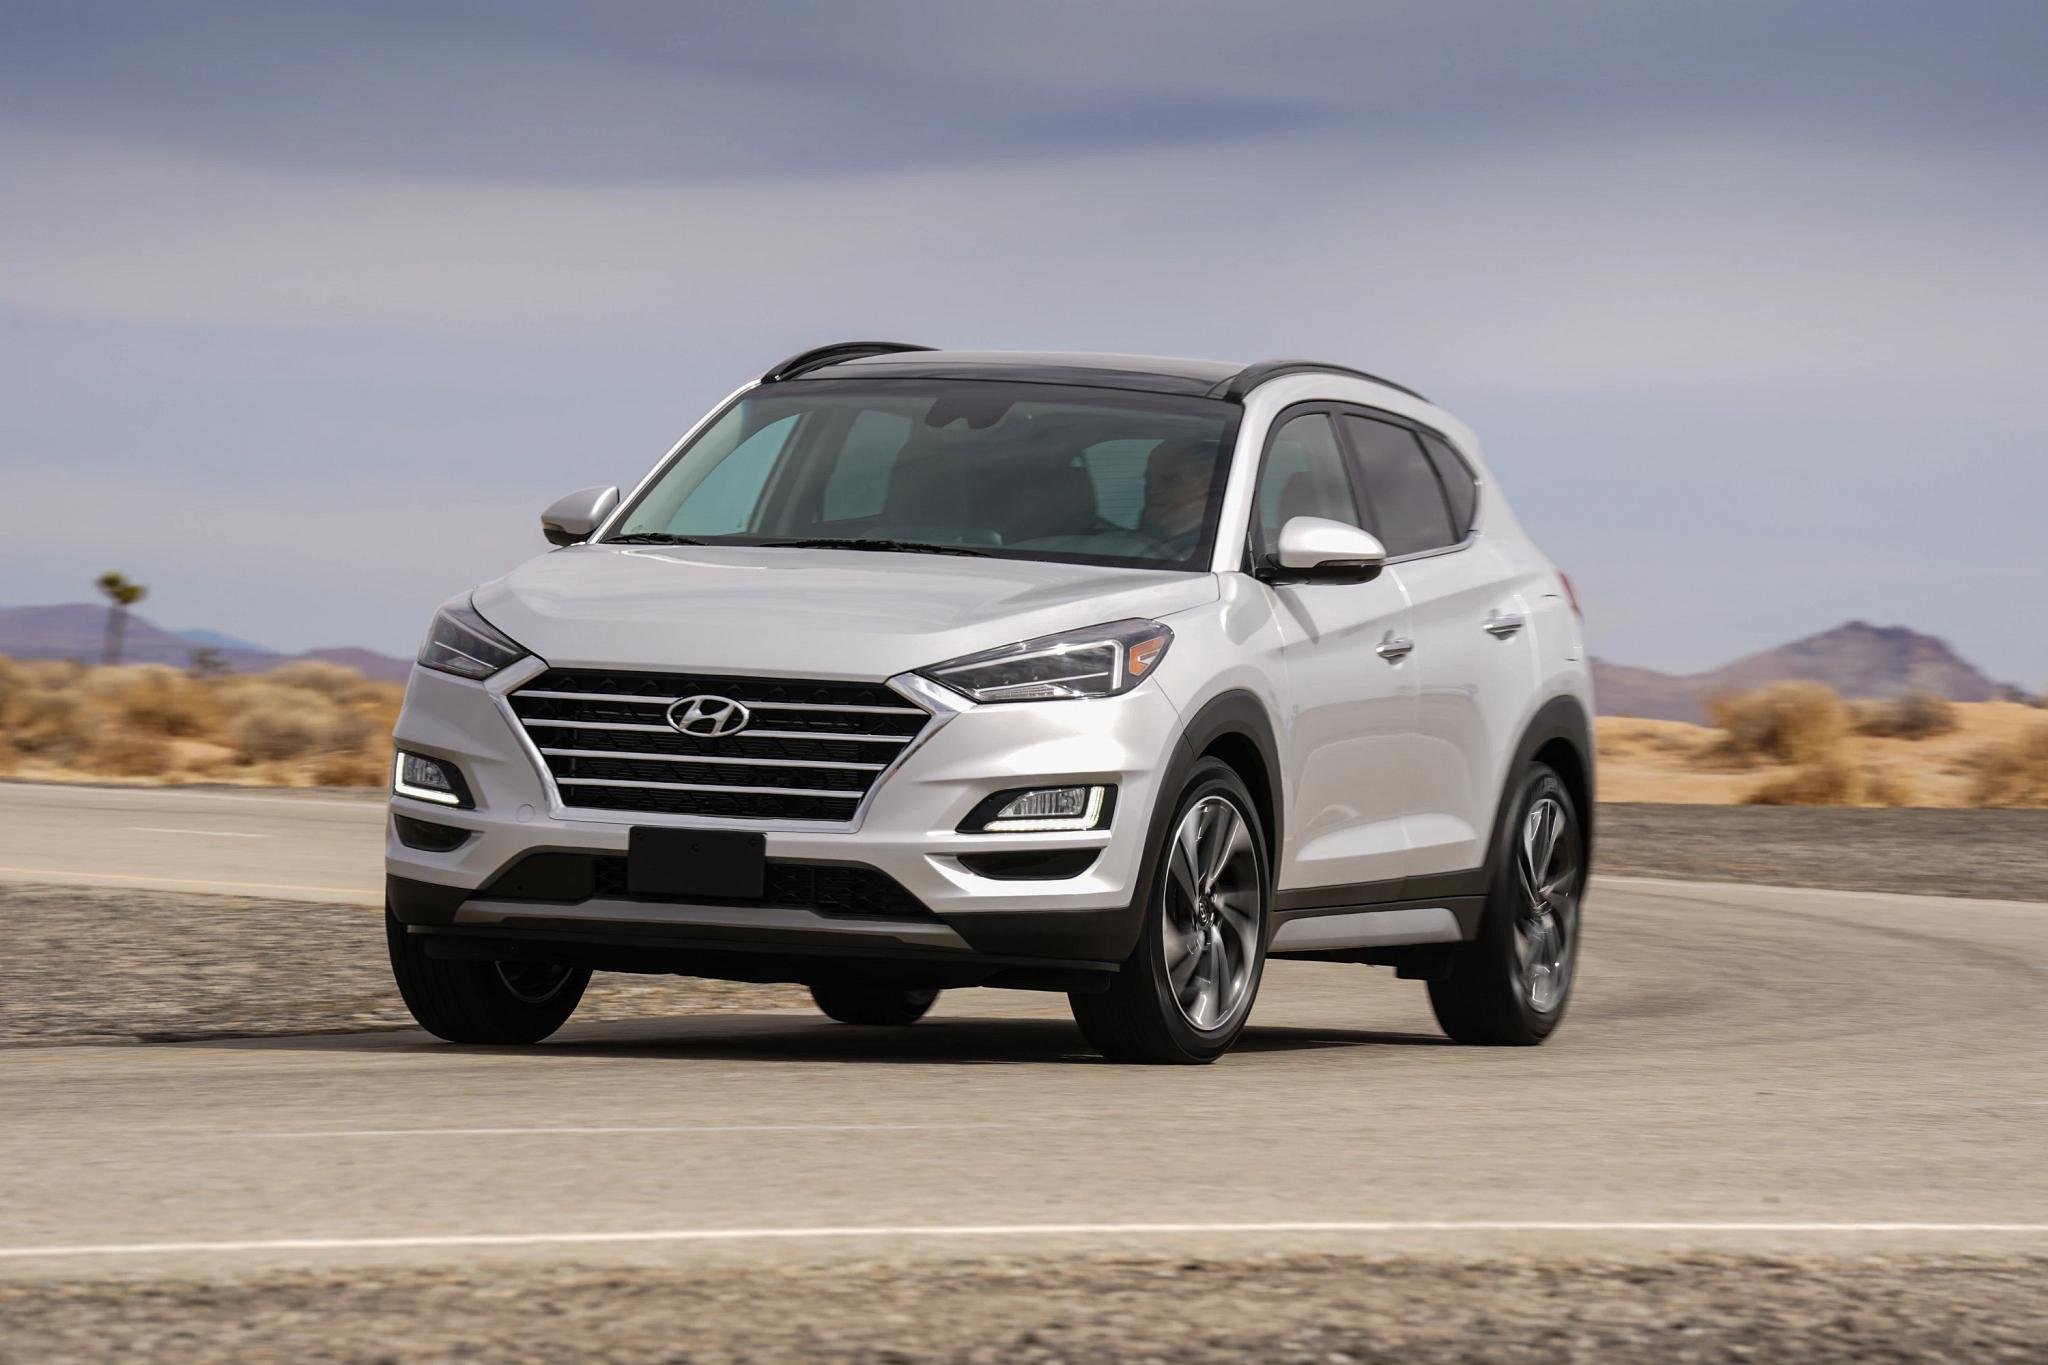 How Do Car Seats Fit in a 2020 Hyundai Tucson?